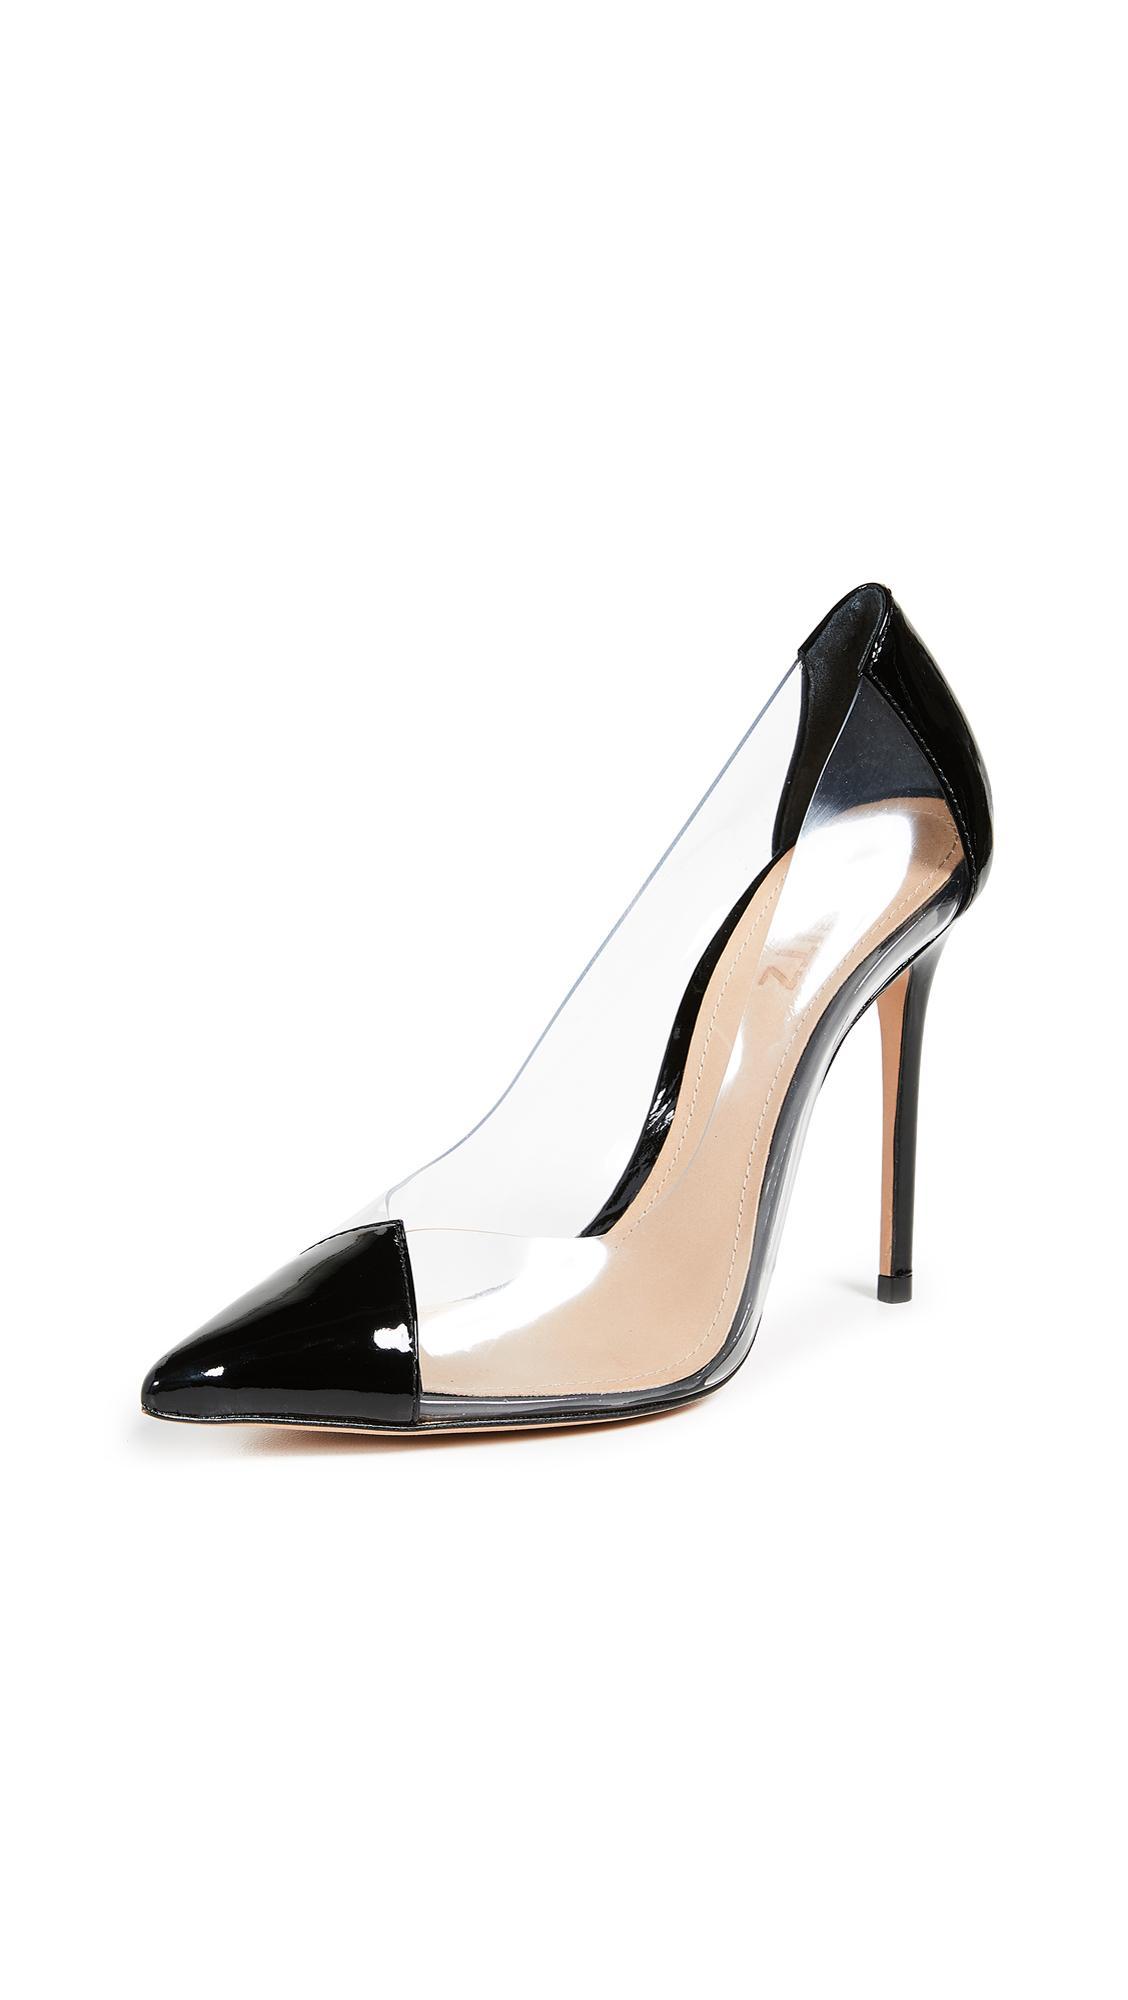 72e7cbfa66848 Schutz Women s Cendi Patent Leather High-Heel Pumps In Black